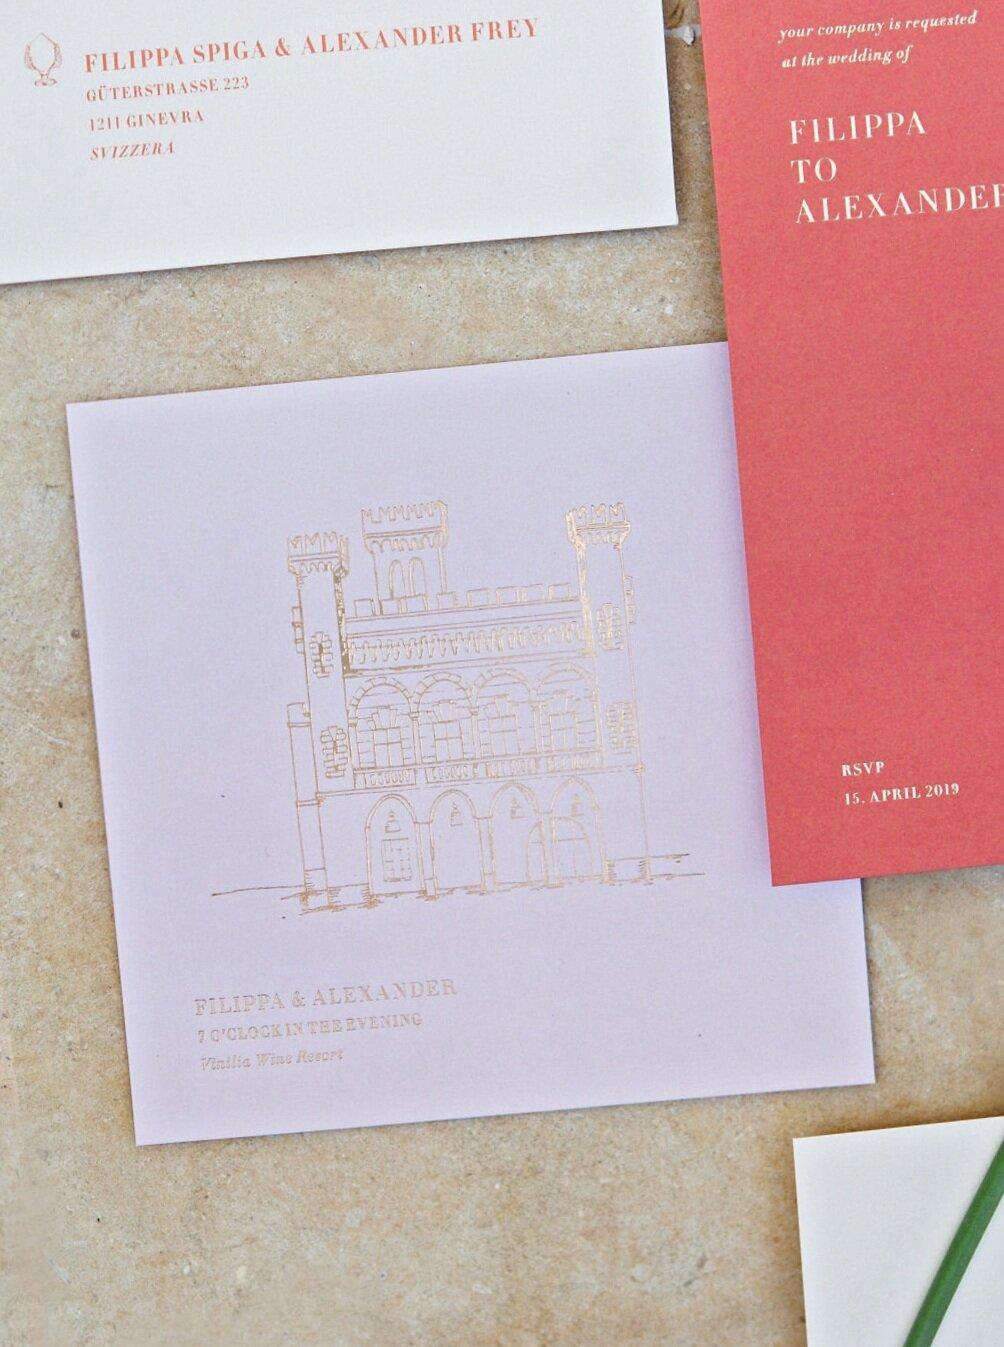 vinilia-wineresort-wedding-apulia-small%C2%A9melanienedelko-6.jpg